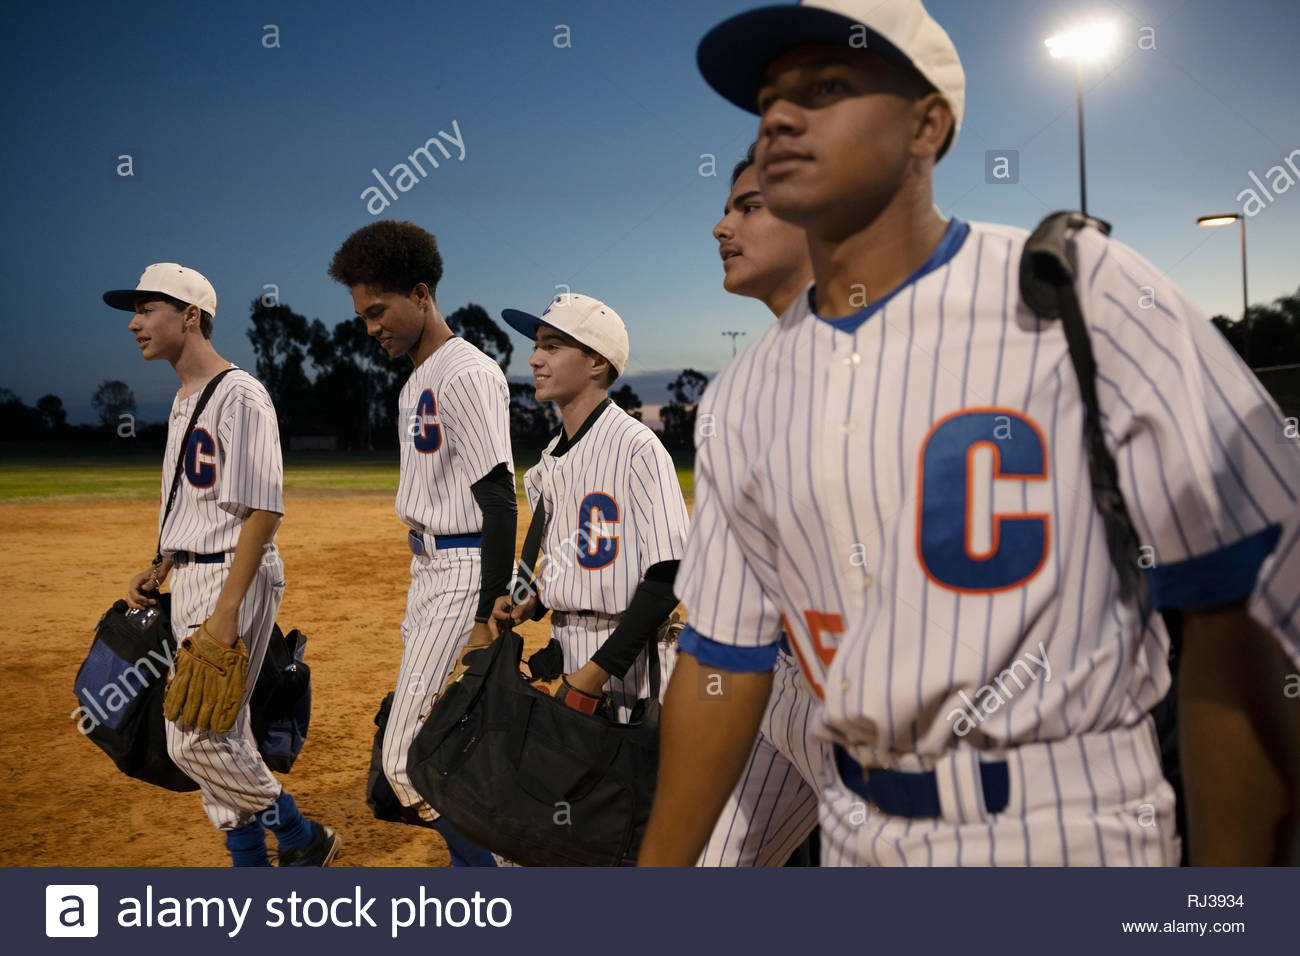 Baseball players walking off field at night - Stock Image